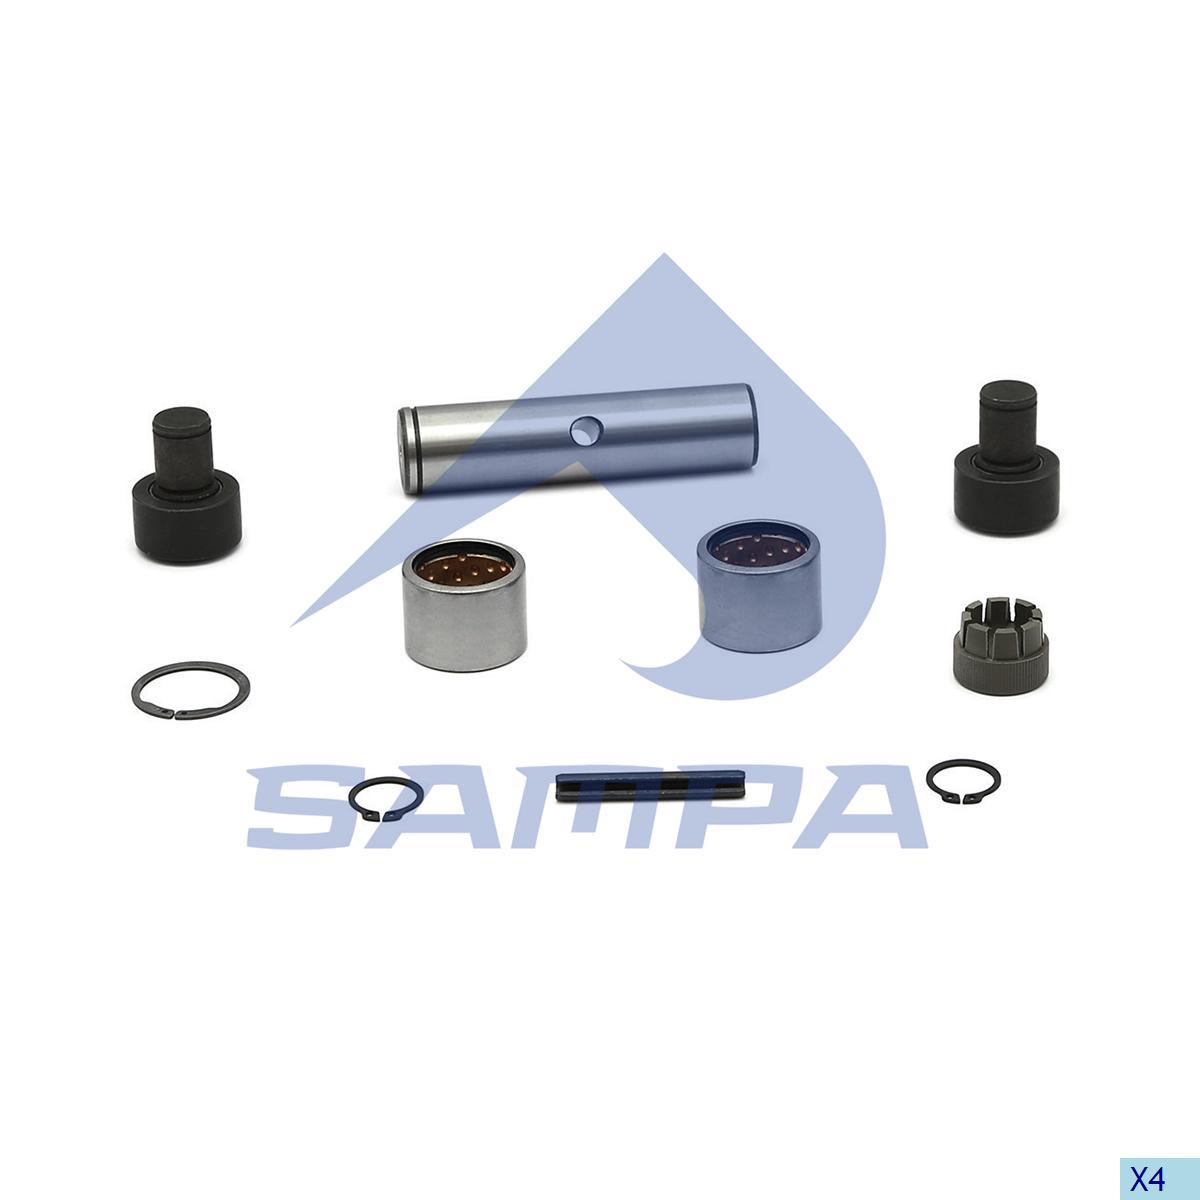 Repair Kit, Clutch Fork, R.V.I., Clutch